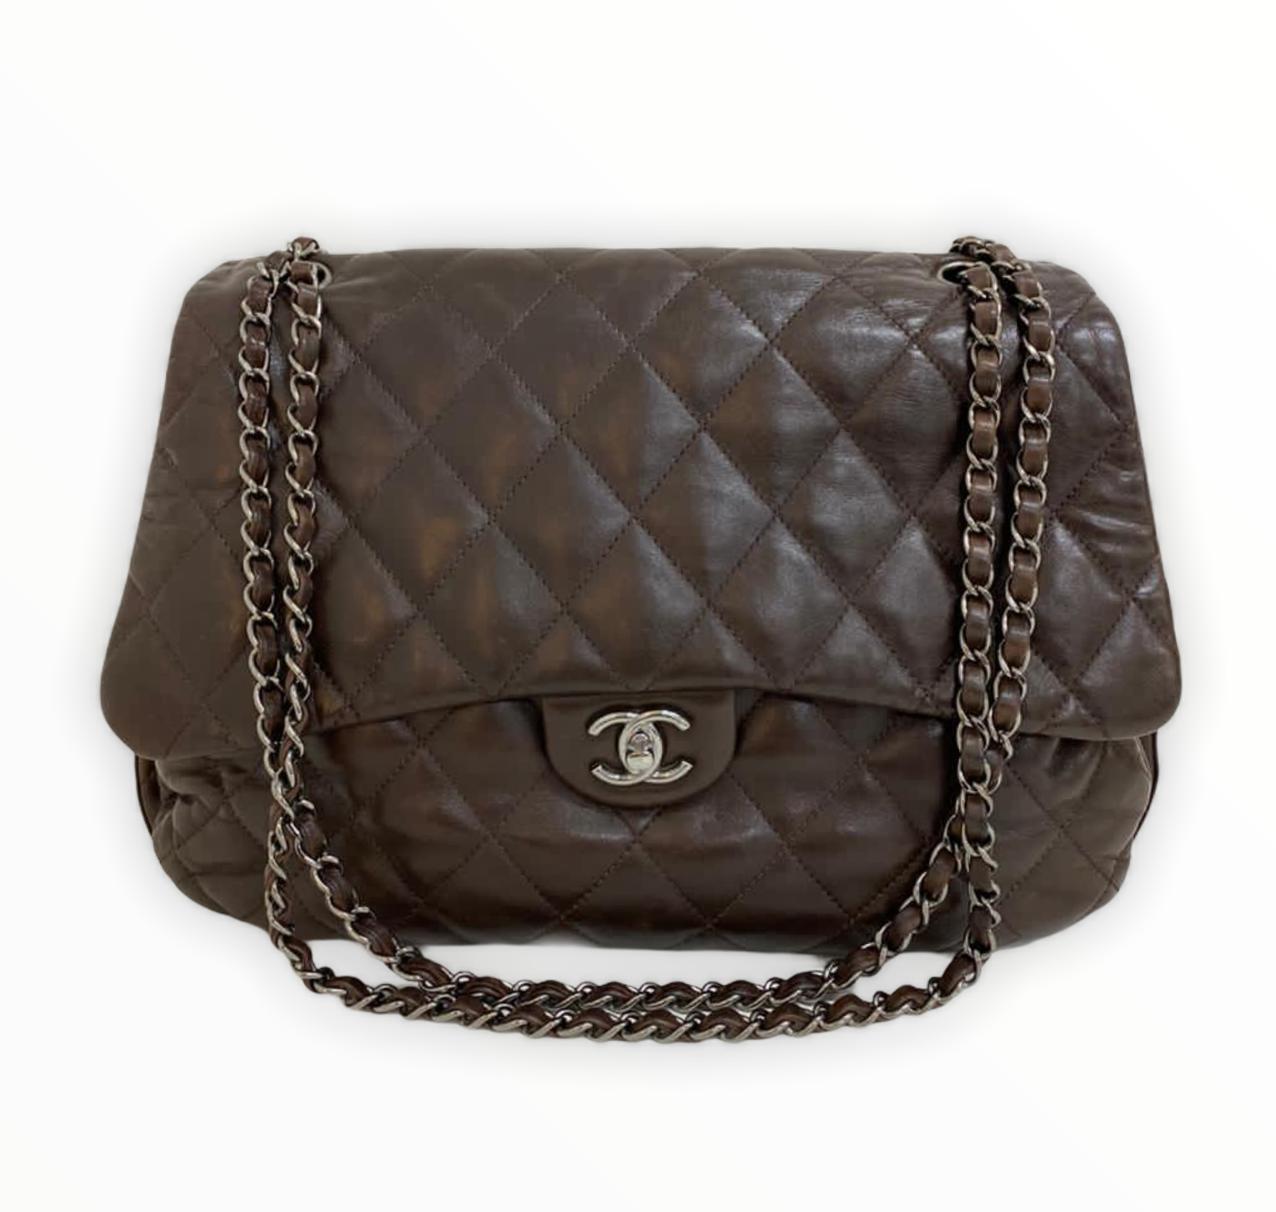 Bolsa Chanel Lambskin